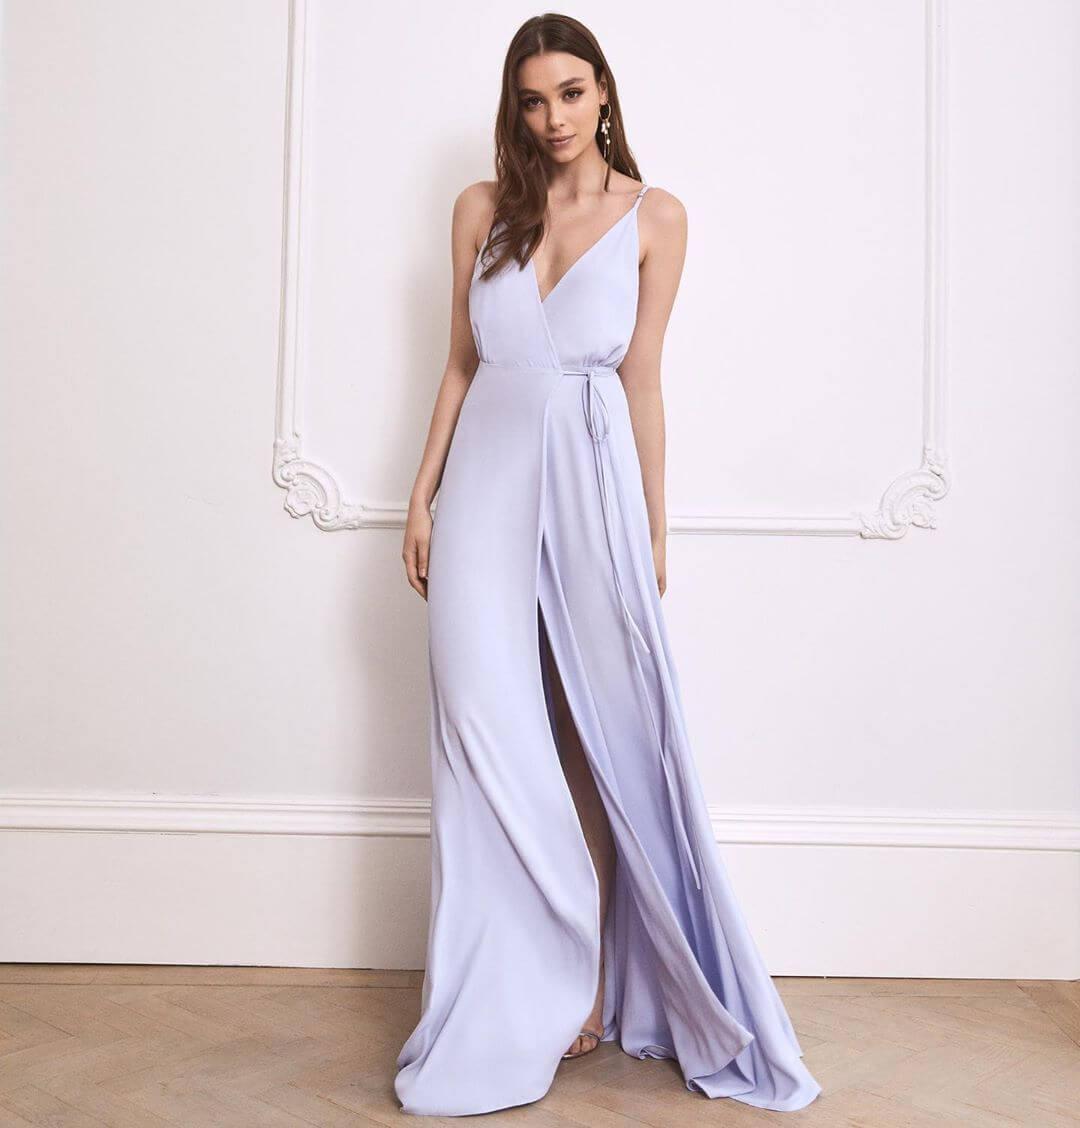 Pastel Color maxi dresses